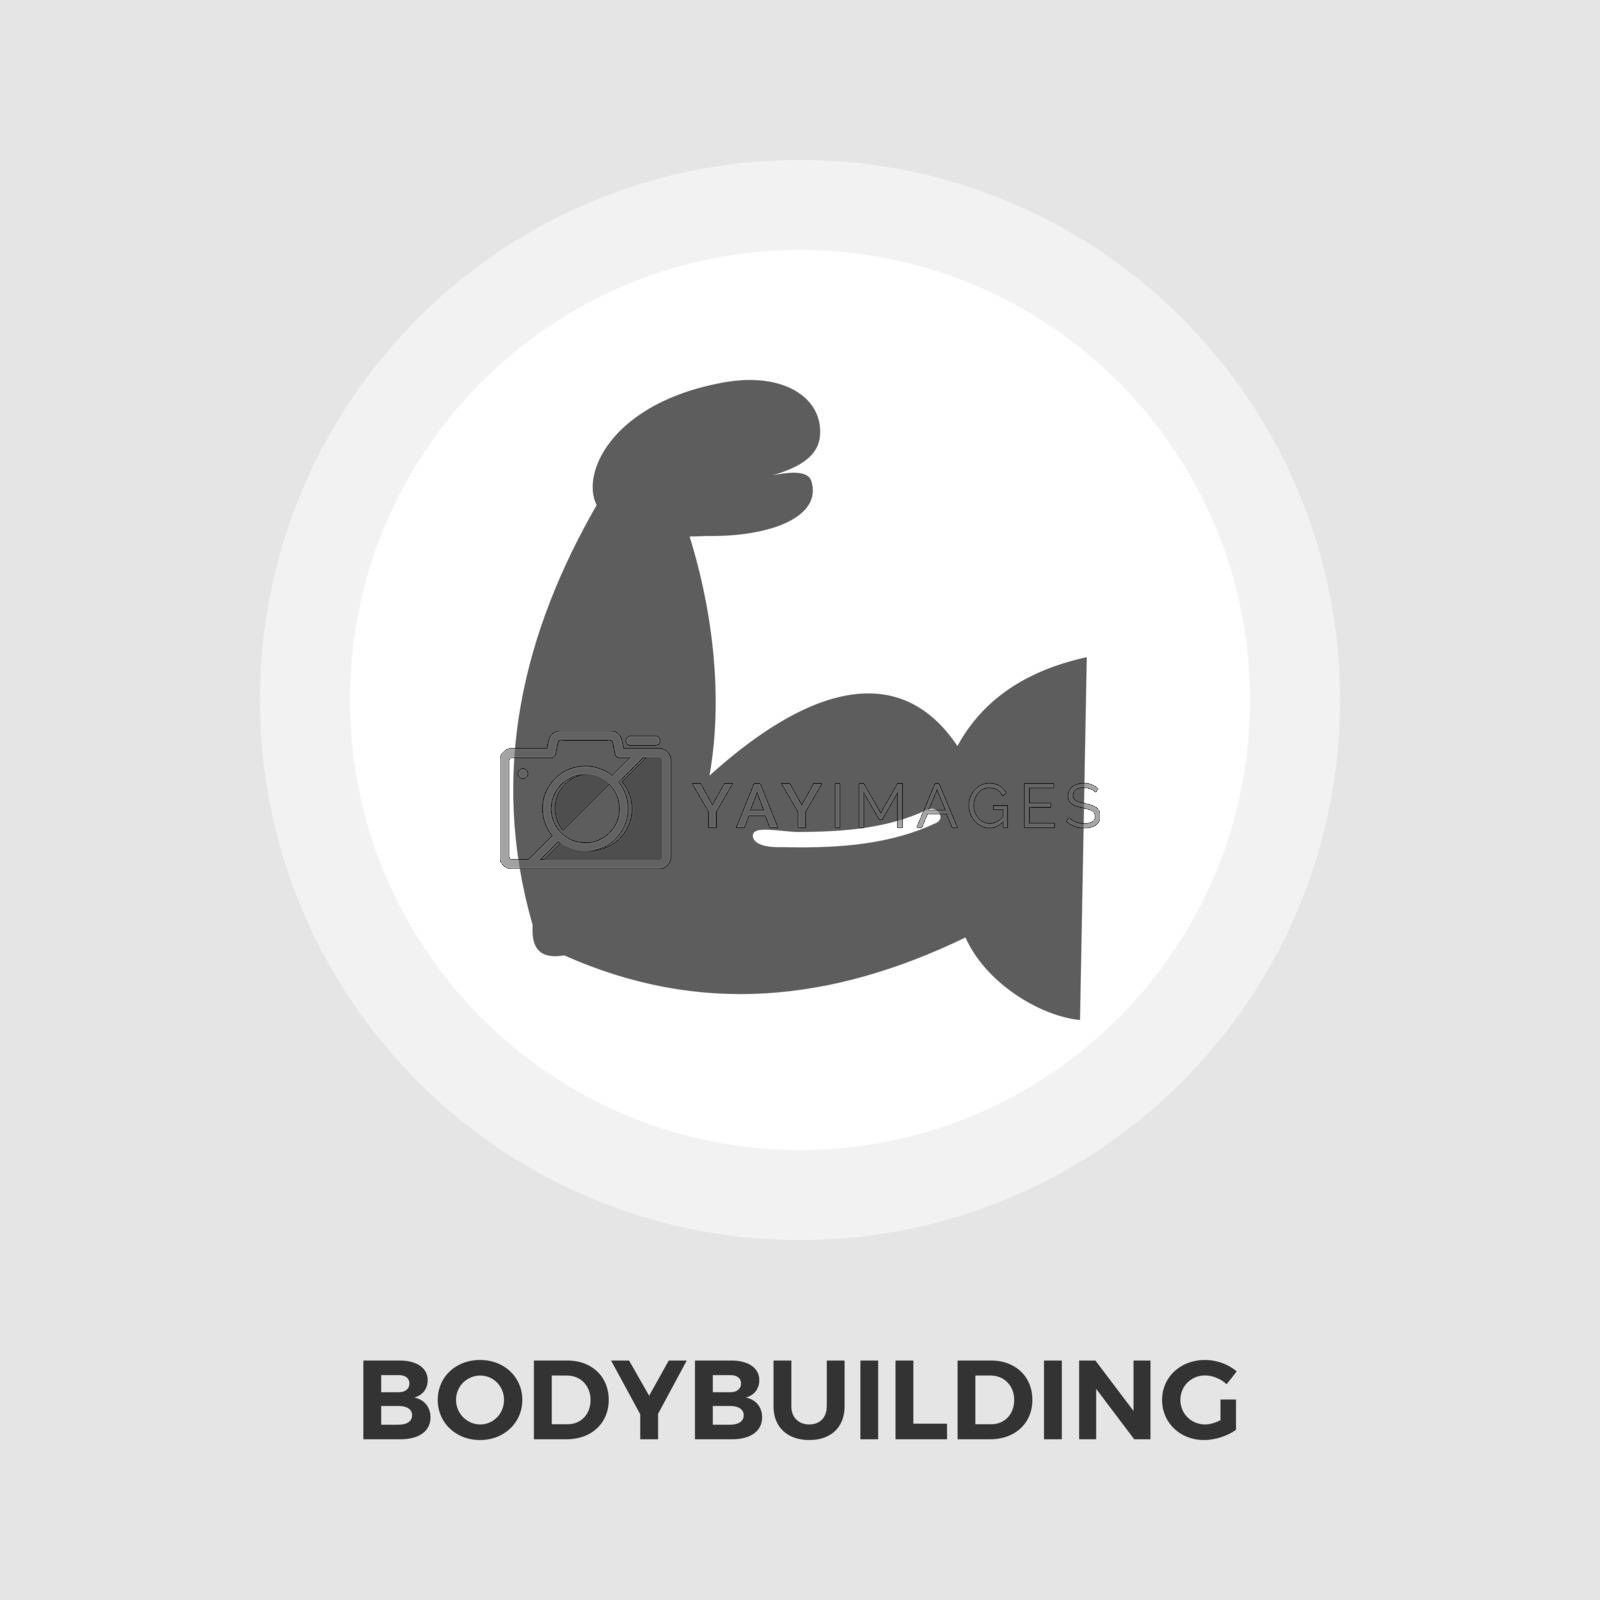 Bodybuilding Vector Flat Icon by smoki